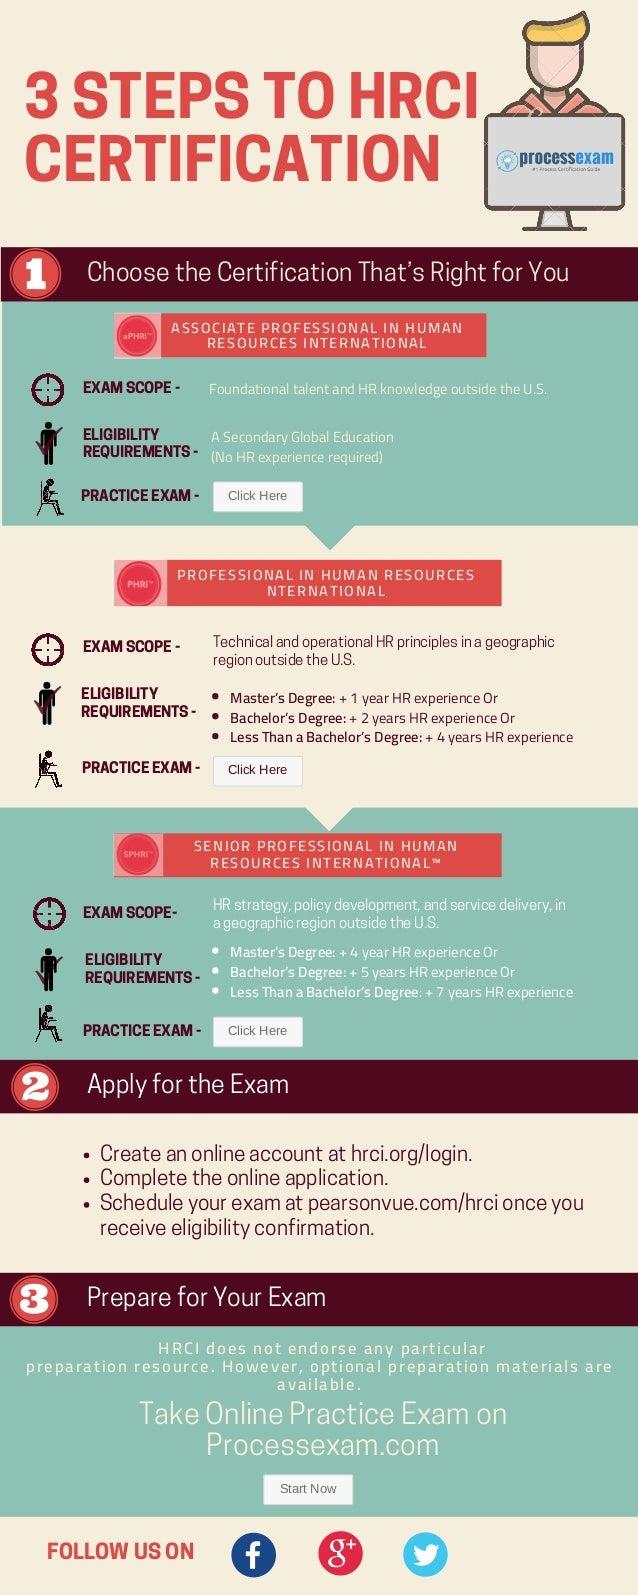 hrci certification steps slideshare proxima